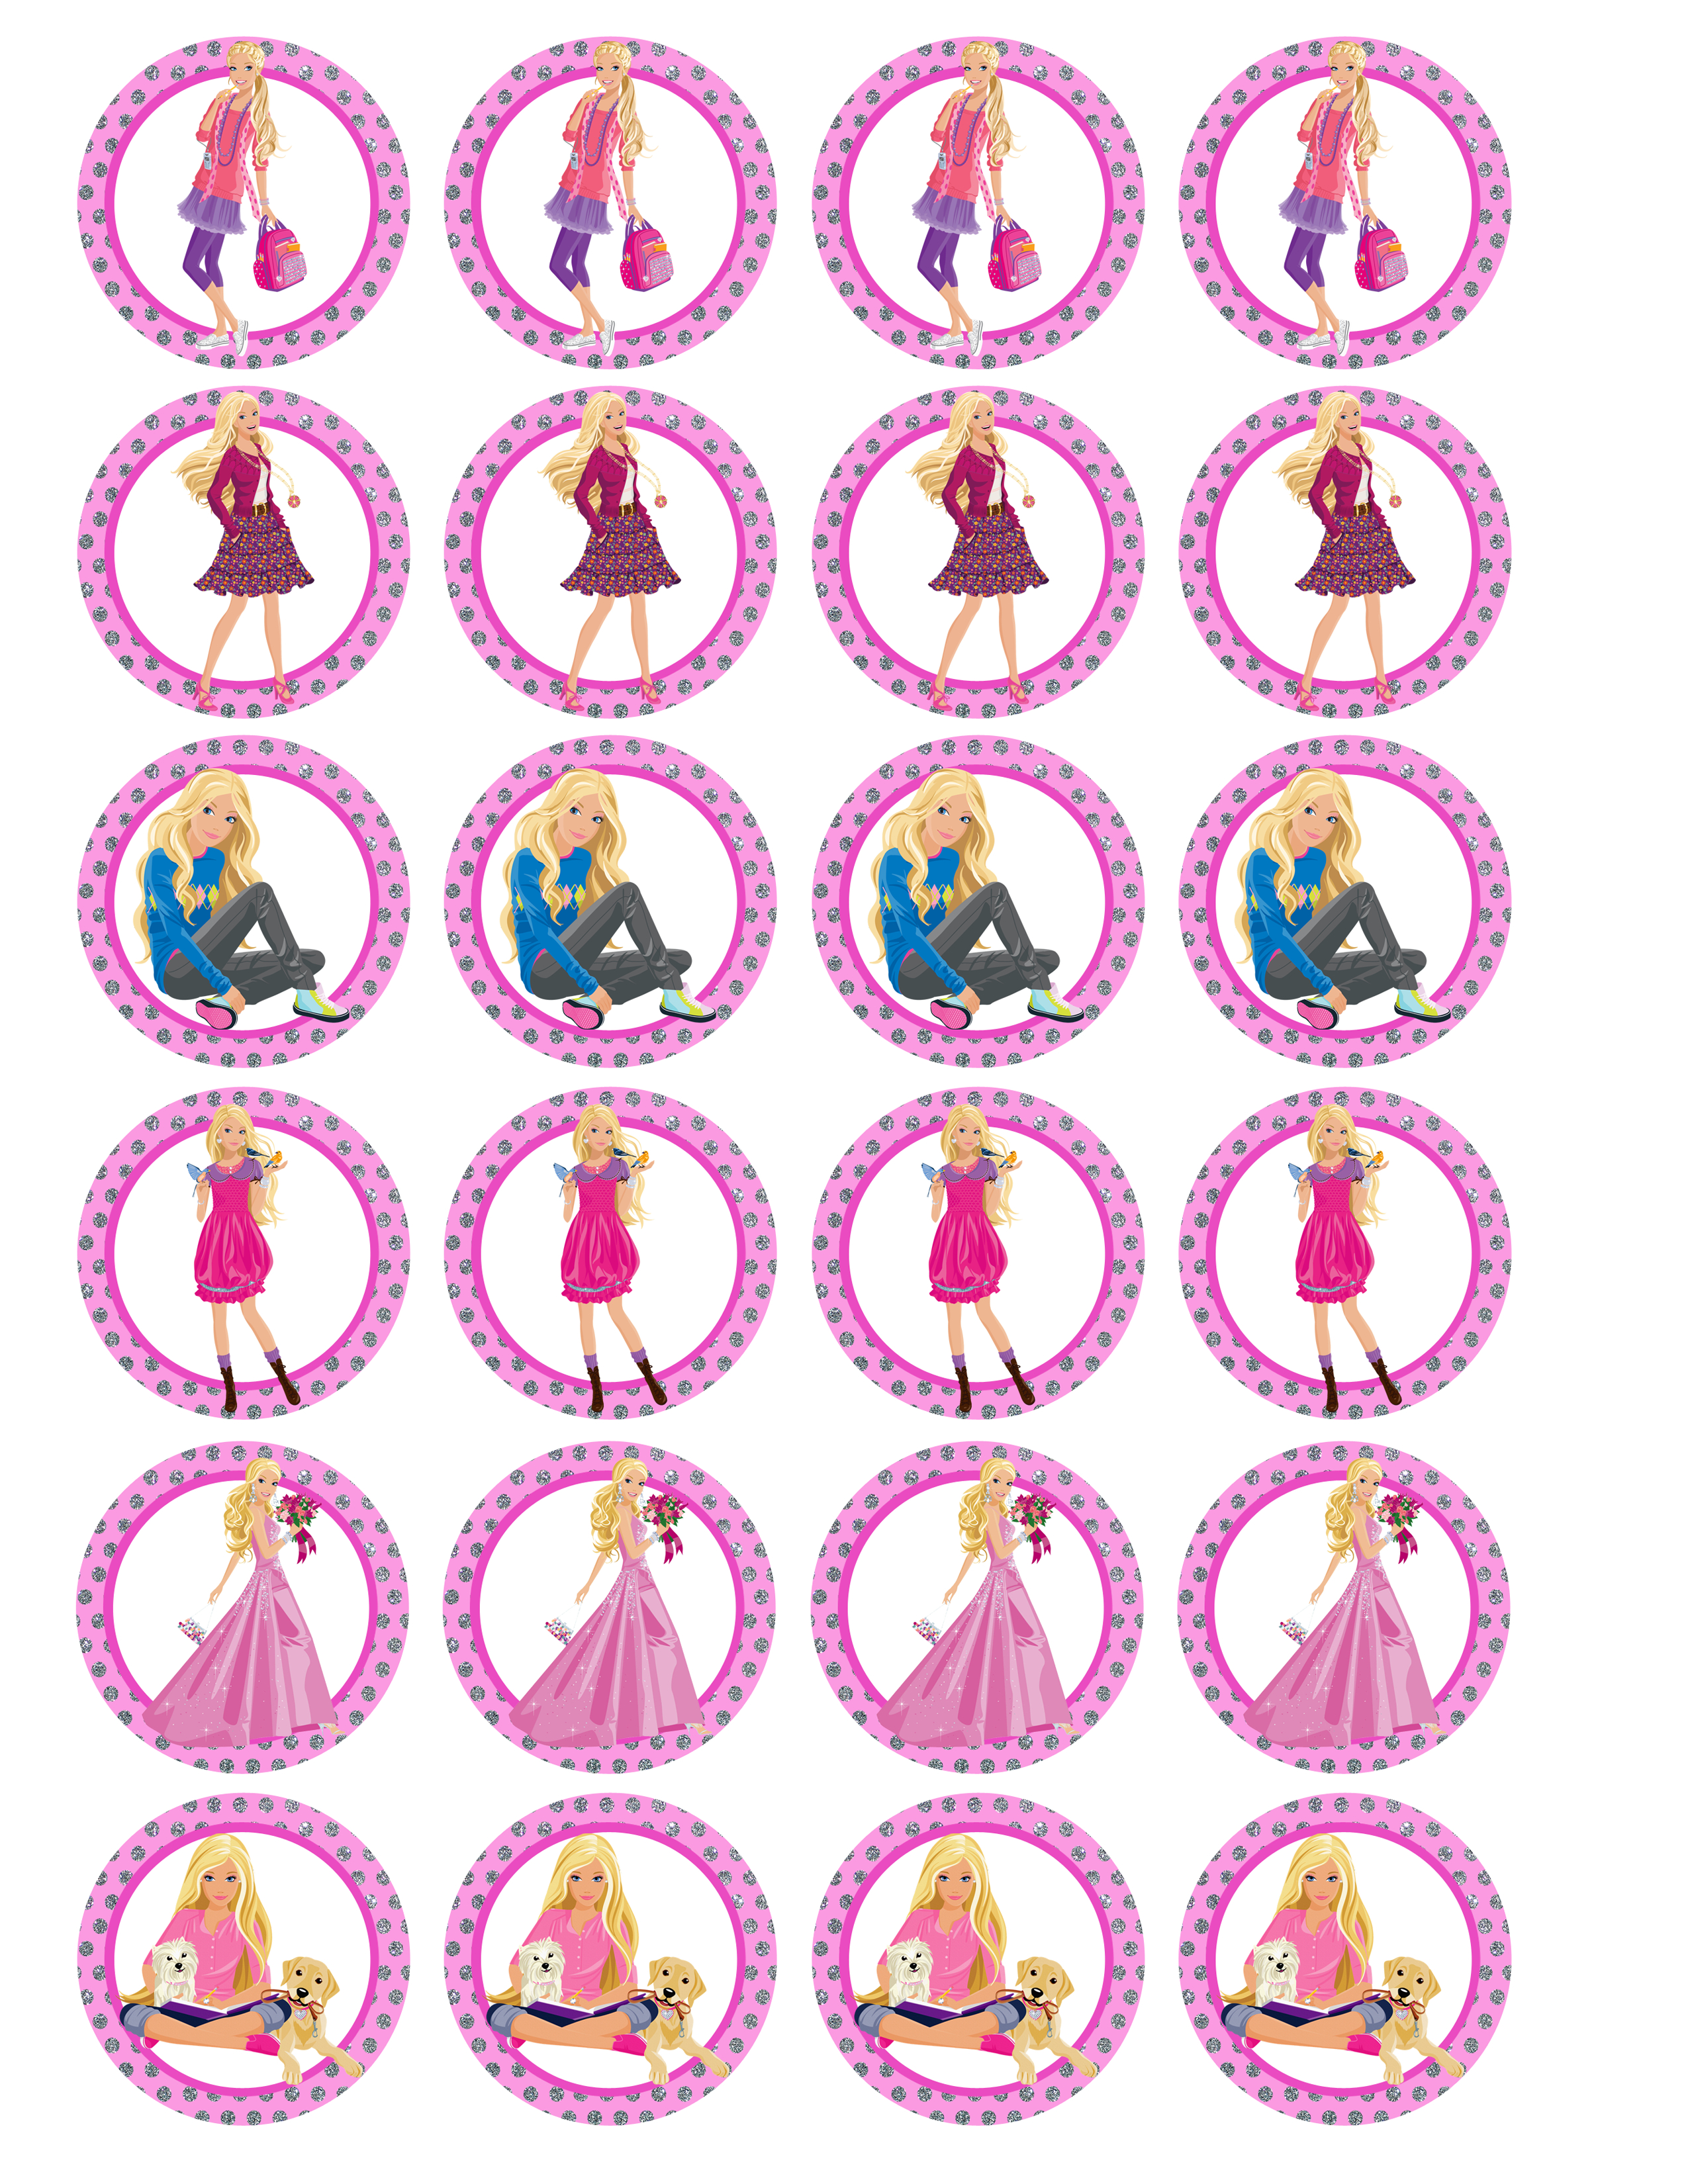 Barbie Party - Creative Printables - Free Printable Barbie Cupcake Toppers